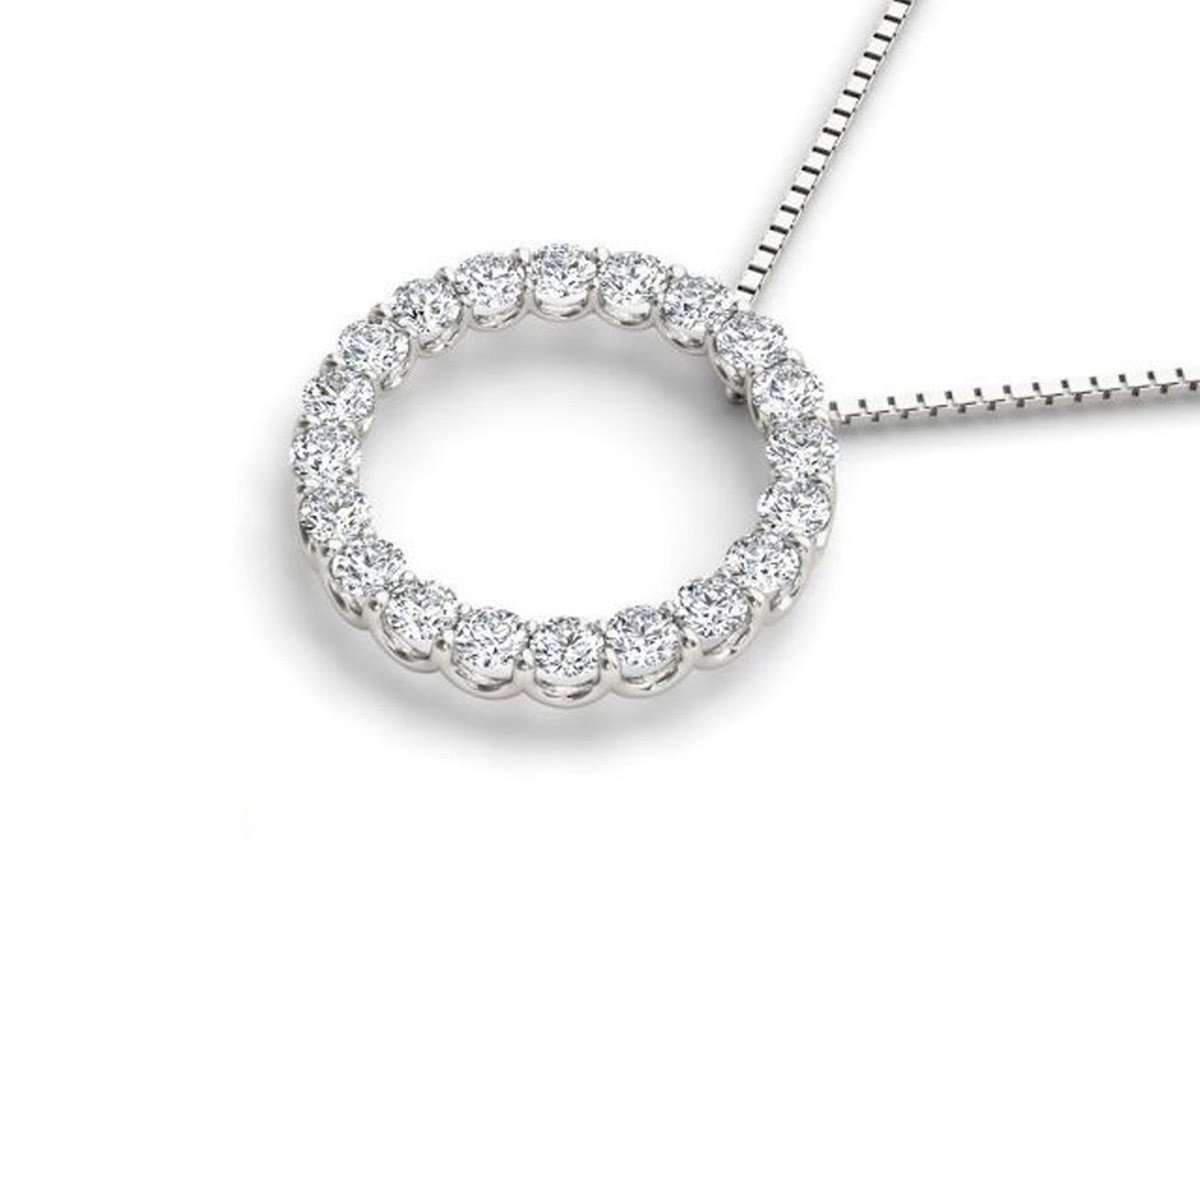 Diamoire Jewels Swarovski Zirconia Pendant in 10Kt White Gold Y9lQE